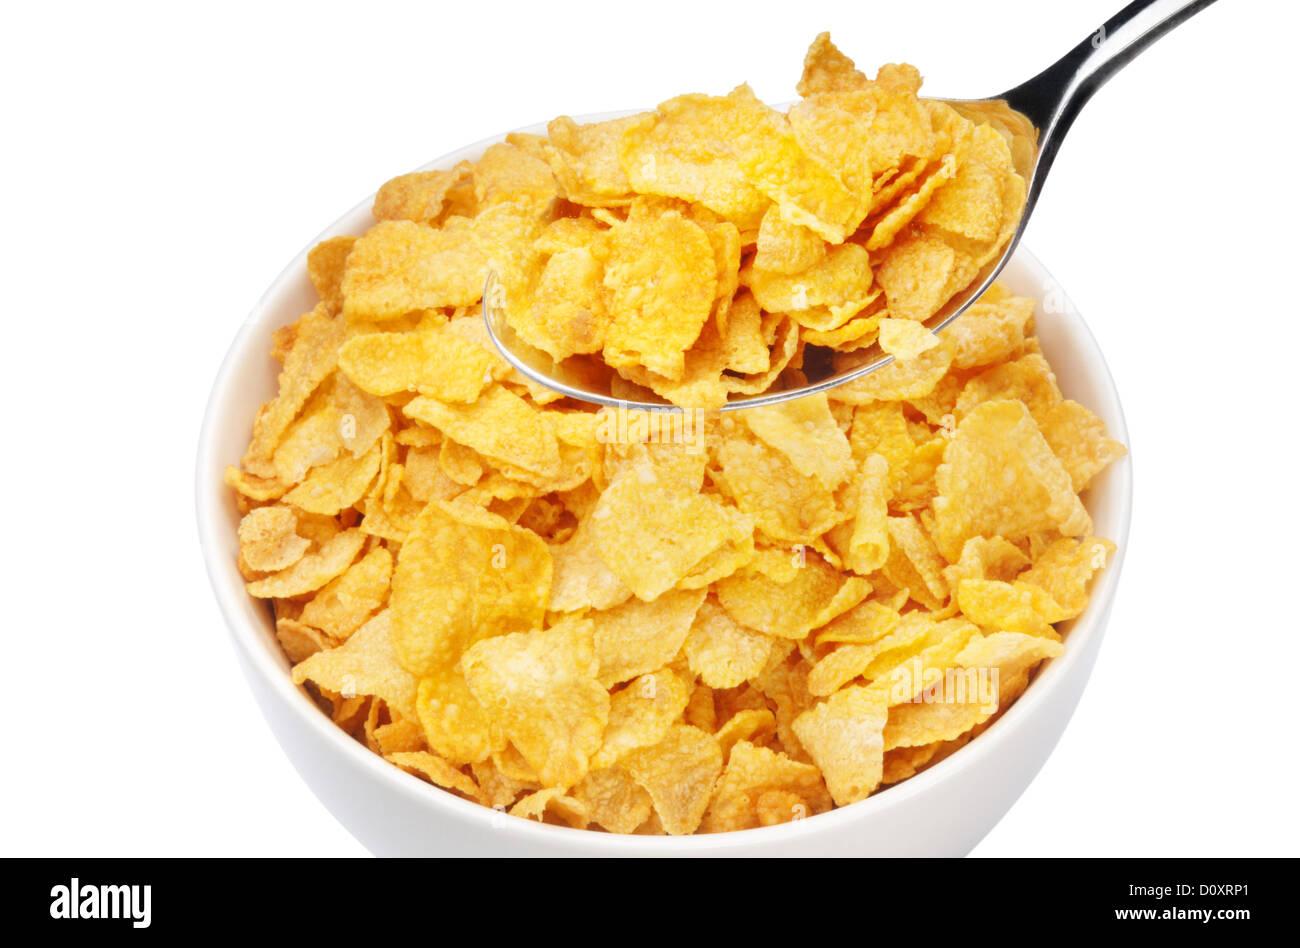 Corn Flakes - John Gollop - Stock Image